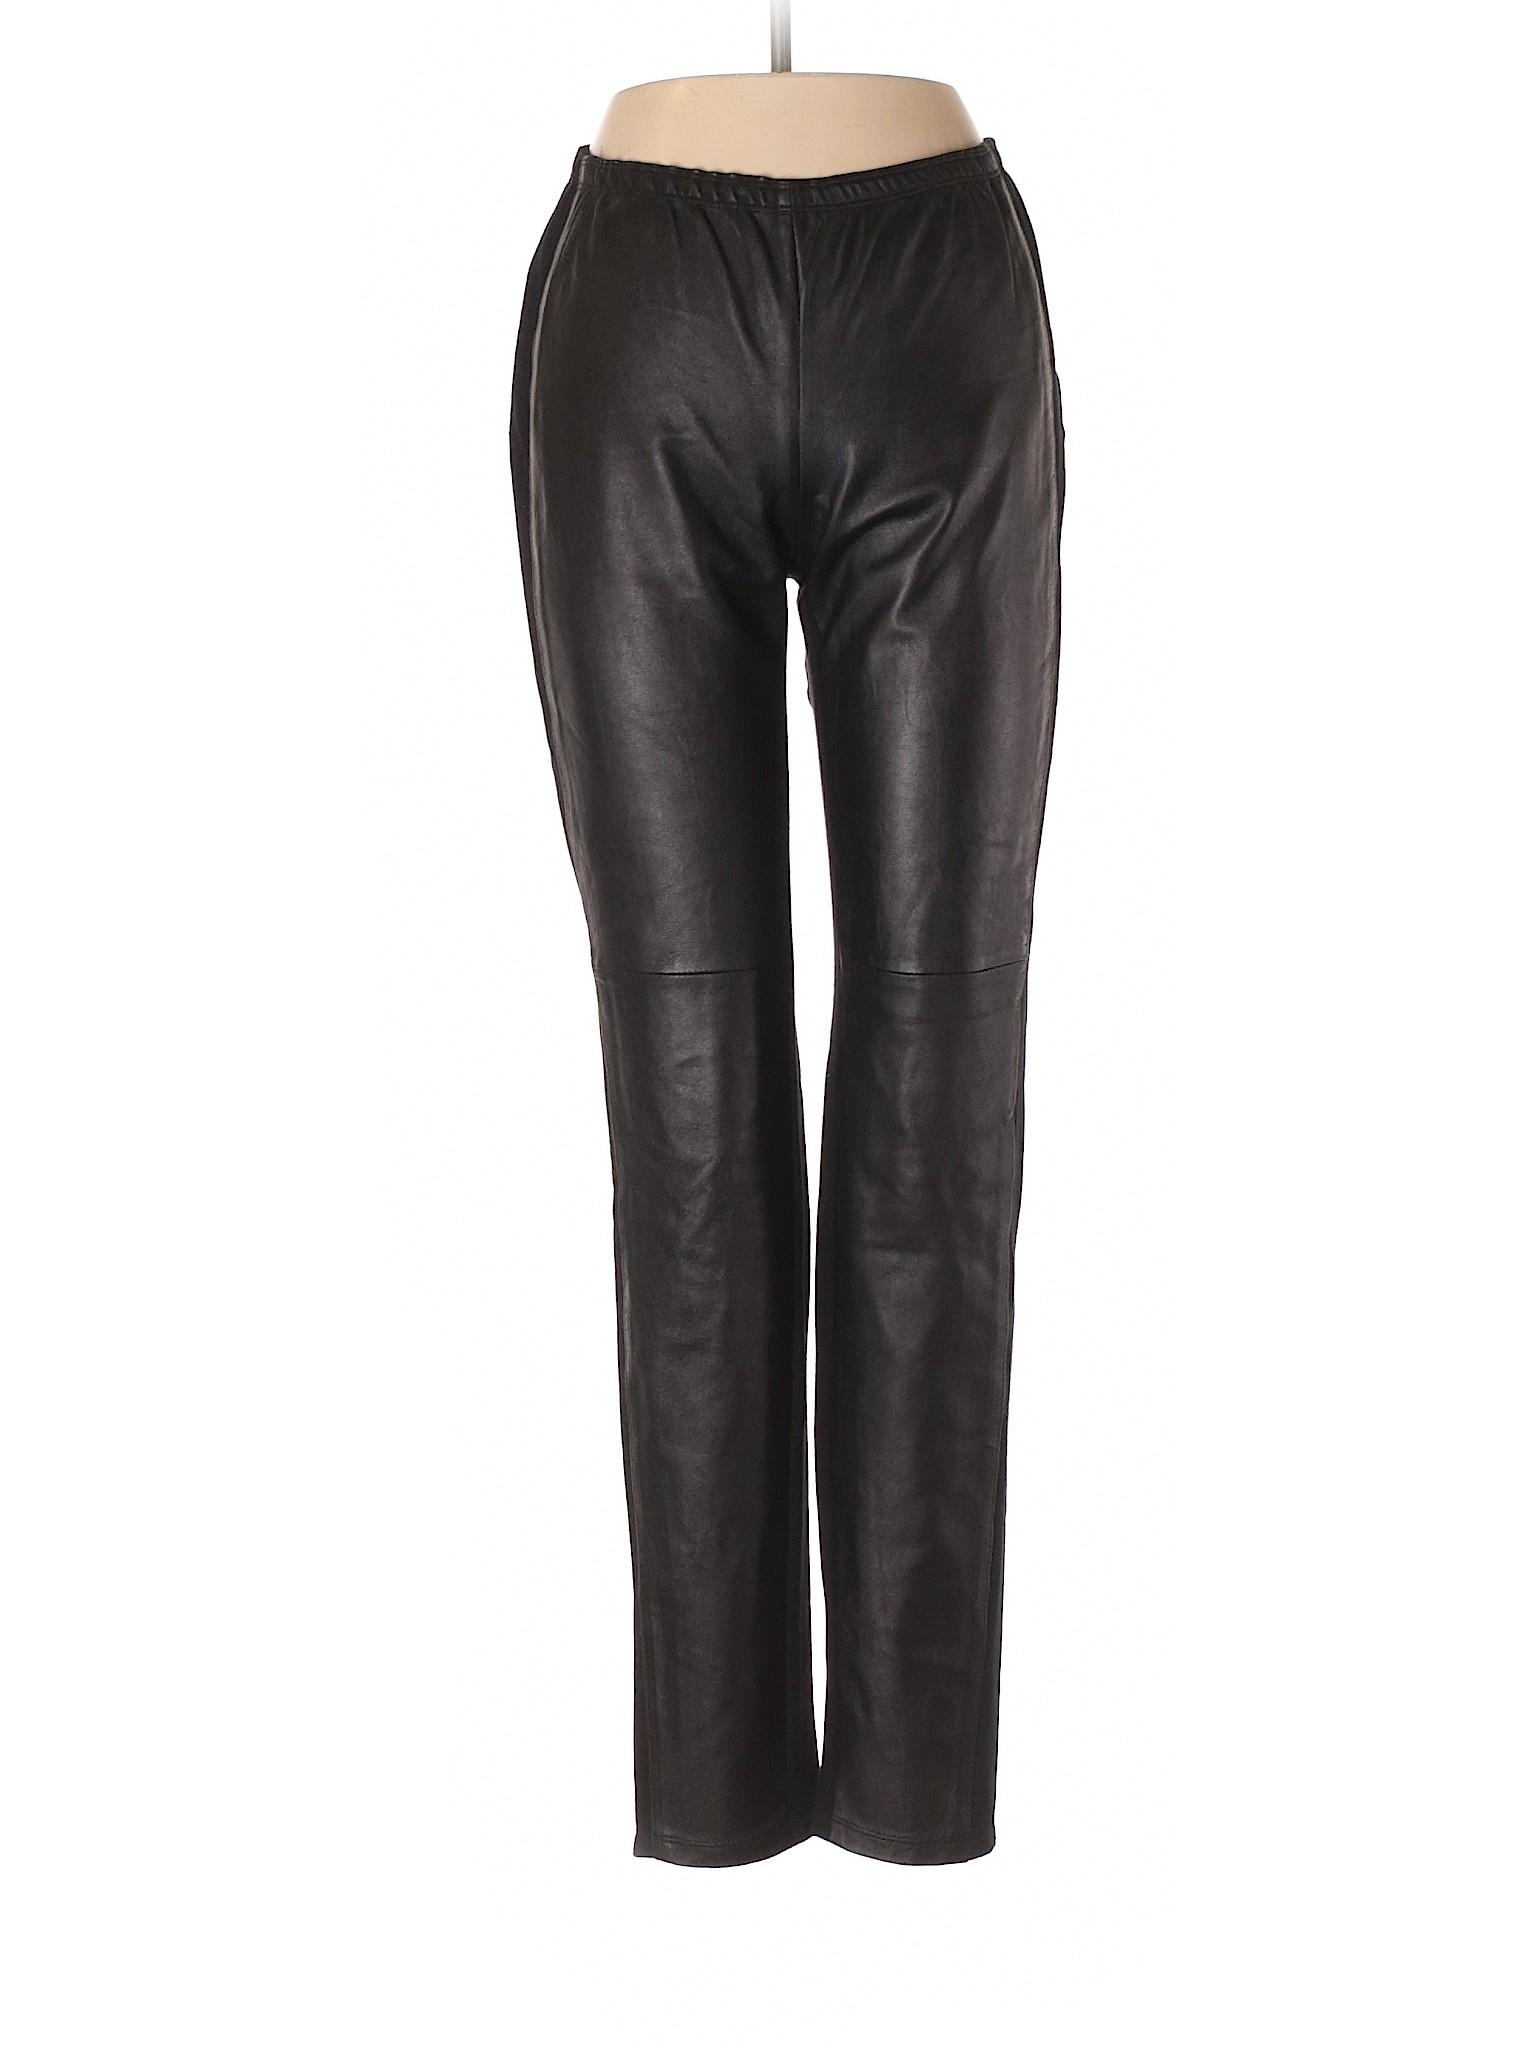 Rezrekshn winter Esther Chen by Leisure Leather Pants zRwqpH5d